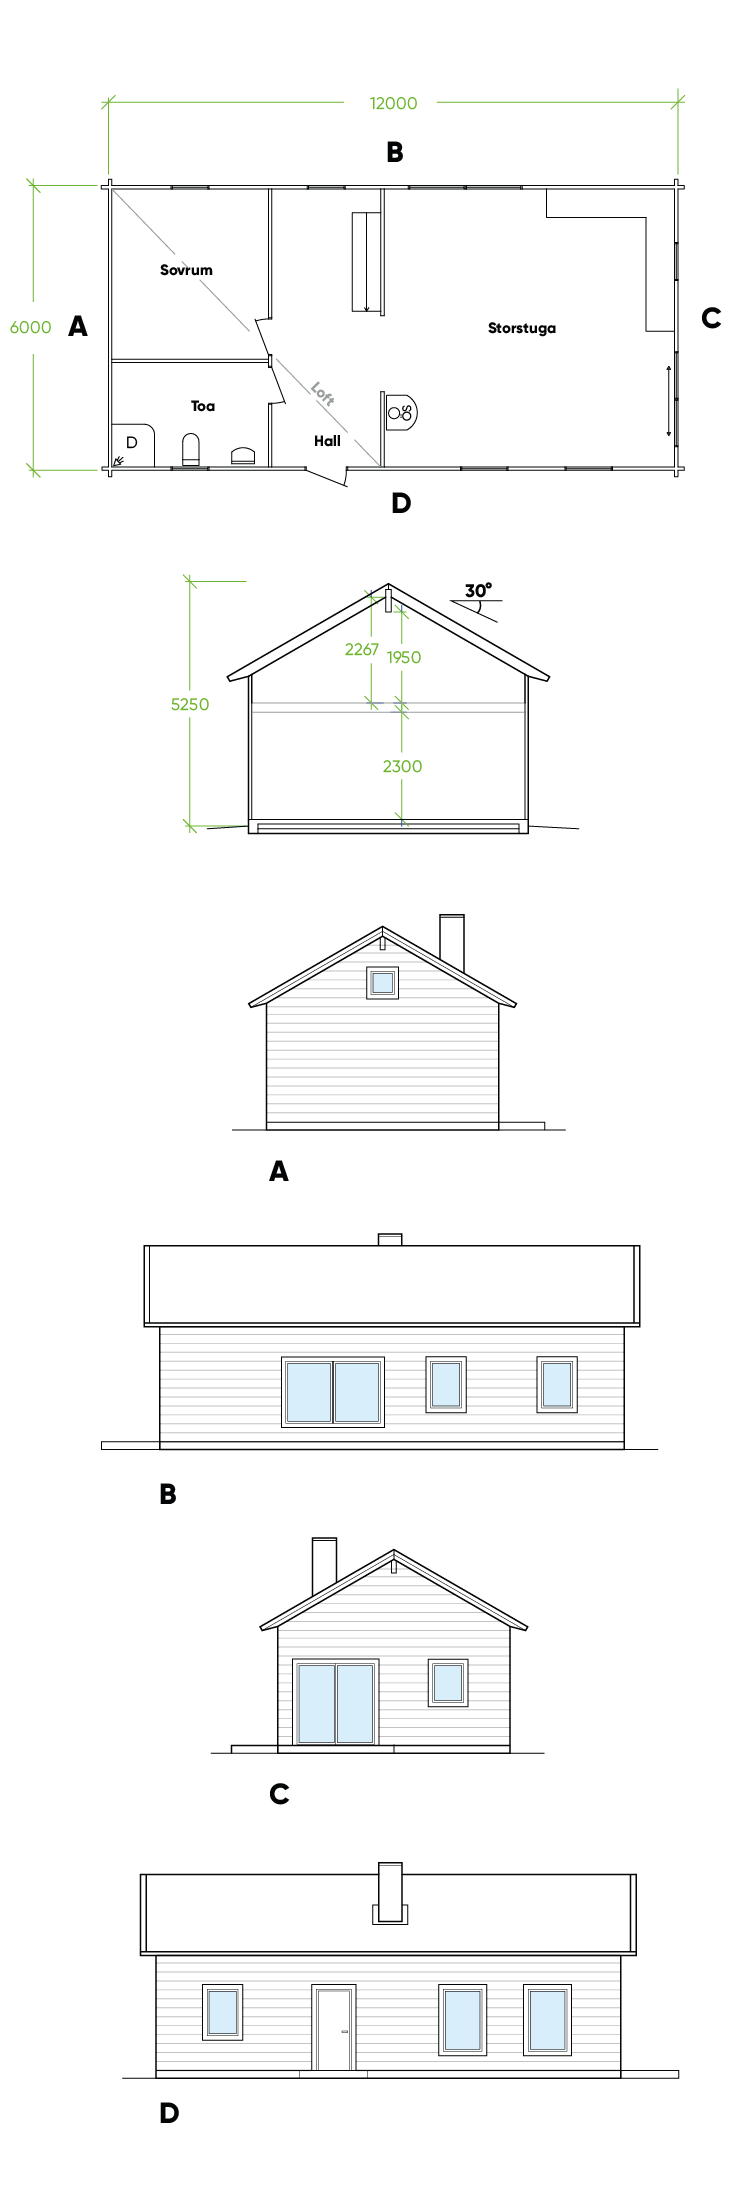 PLANRITNING-lappvattnet-02-02-02 (1)